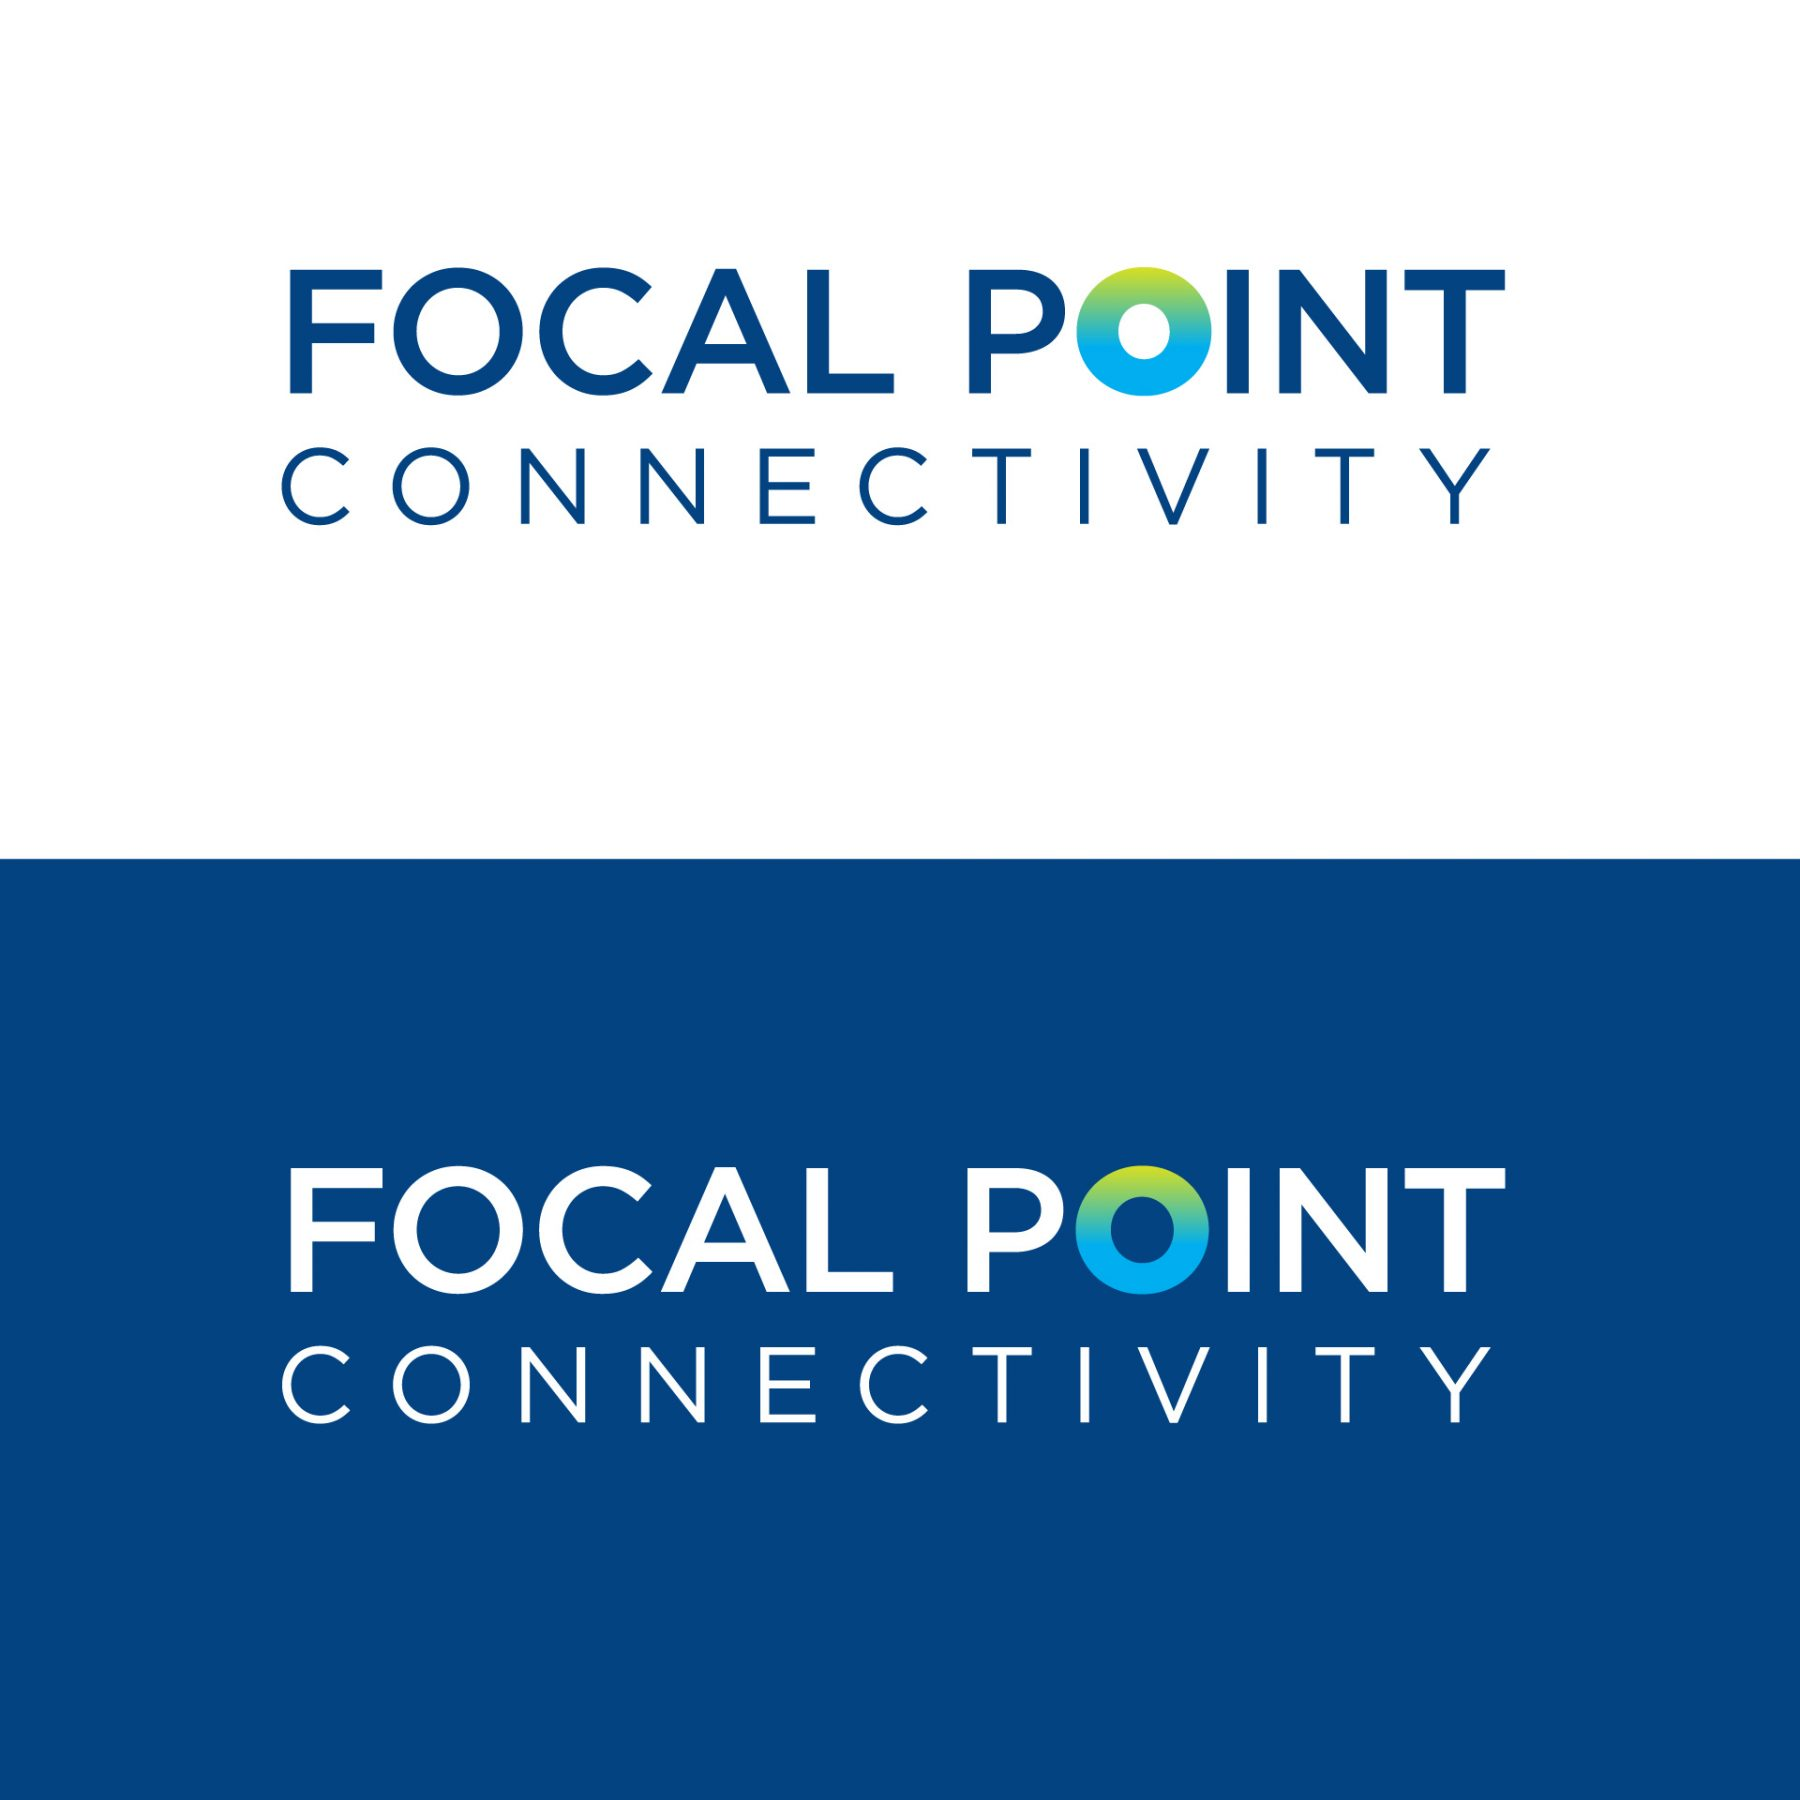 Focal Point Connectivity - logo